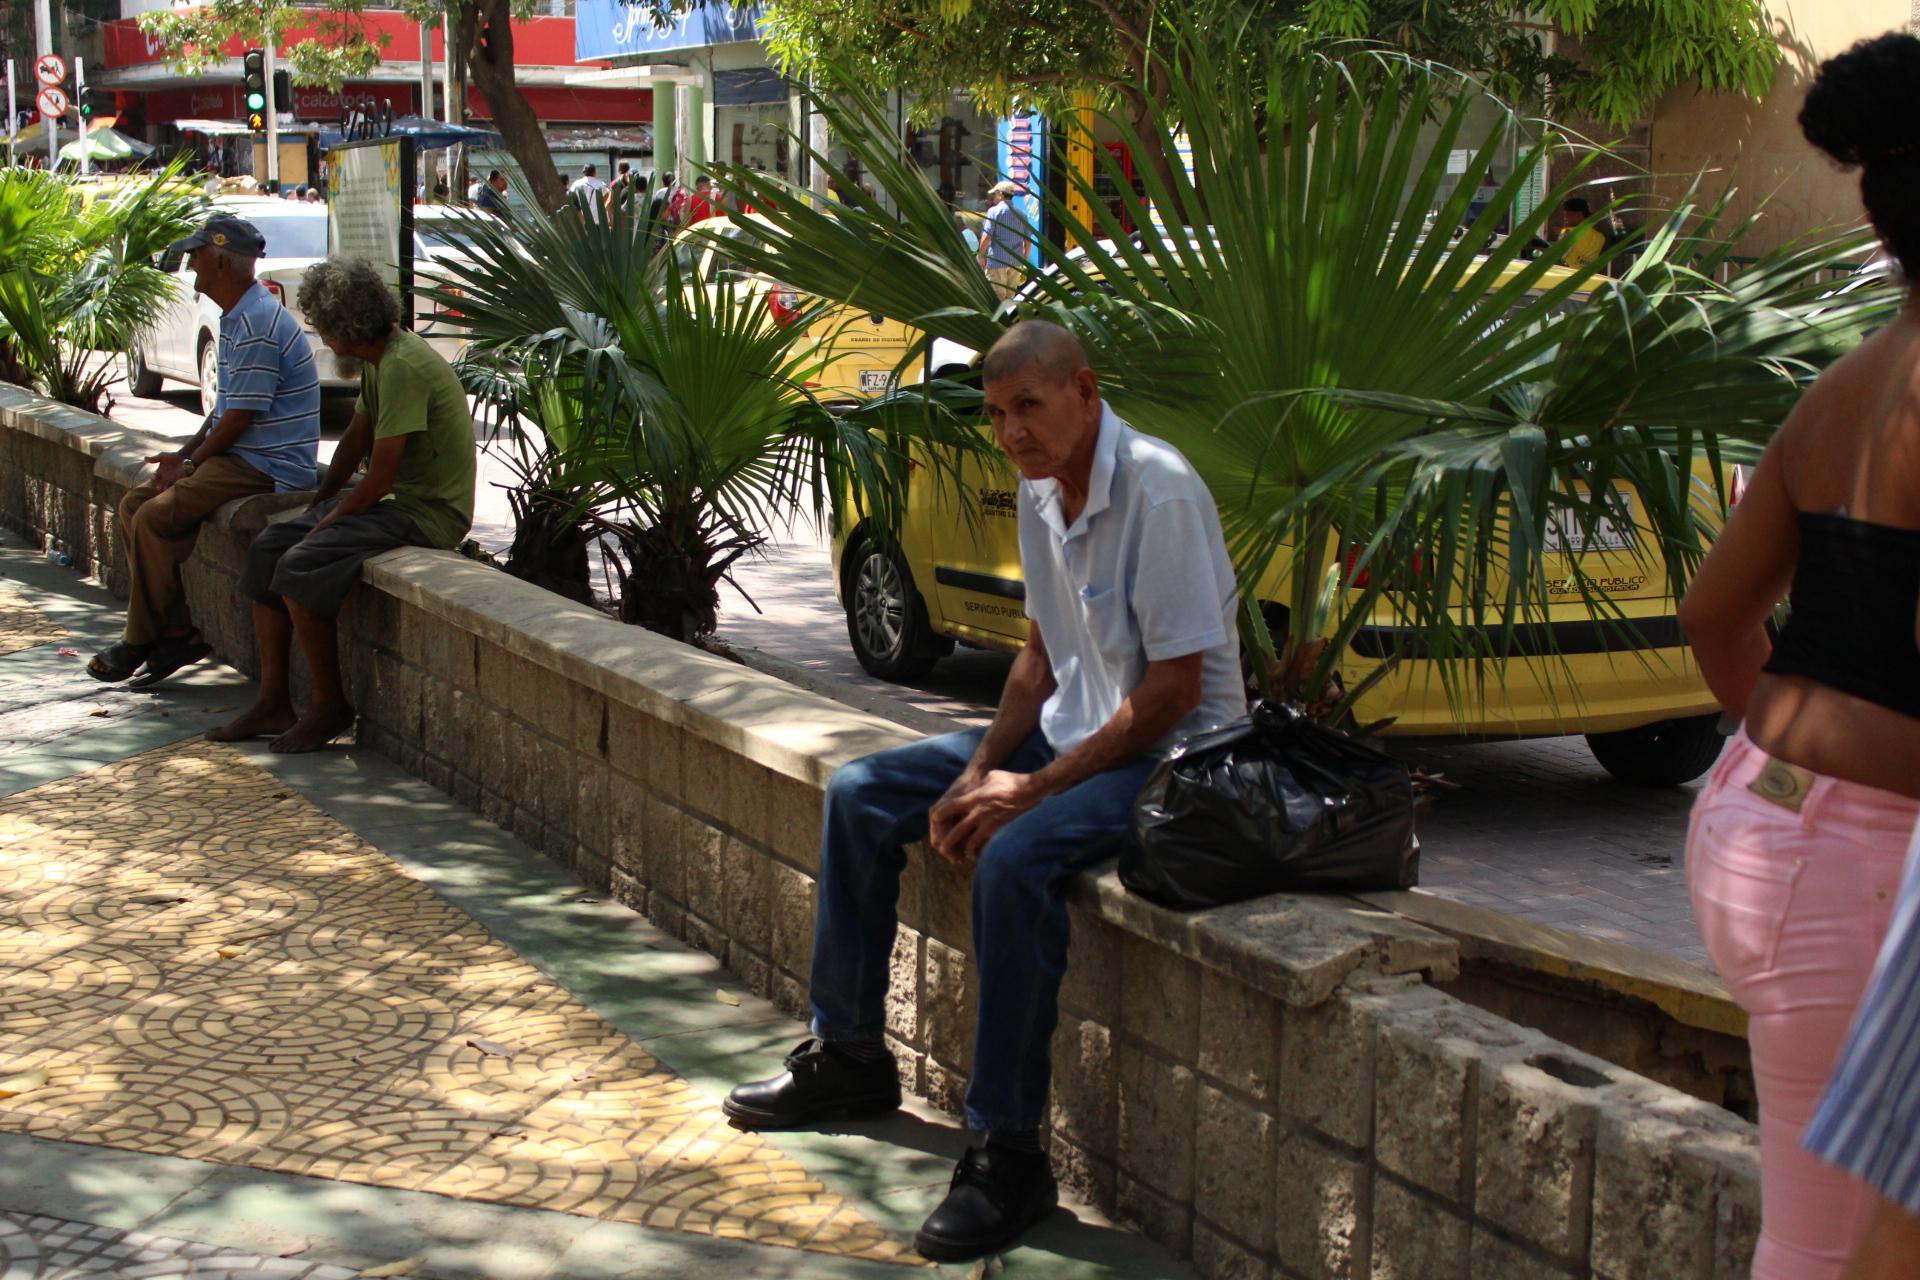 Subsidio Colombia Mayor será entregado a partir de hoy